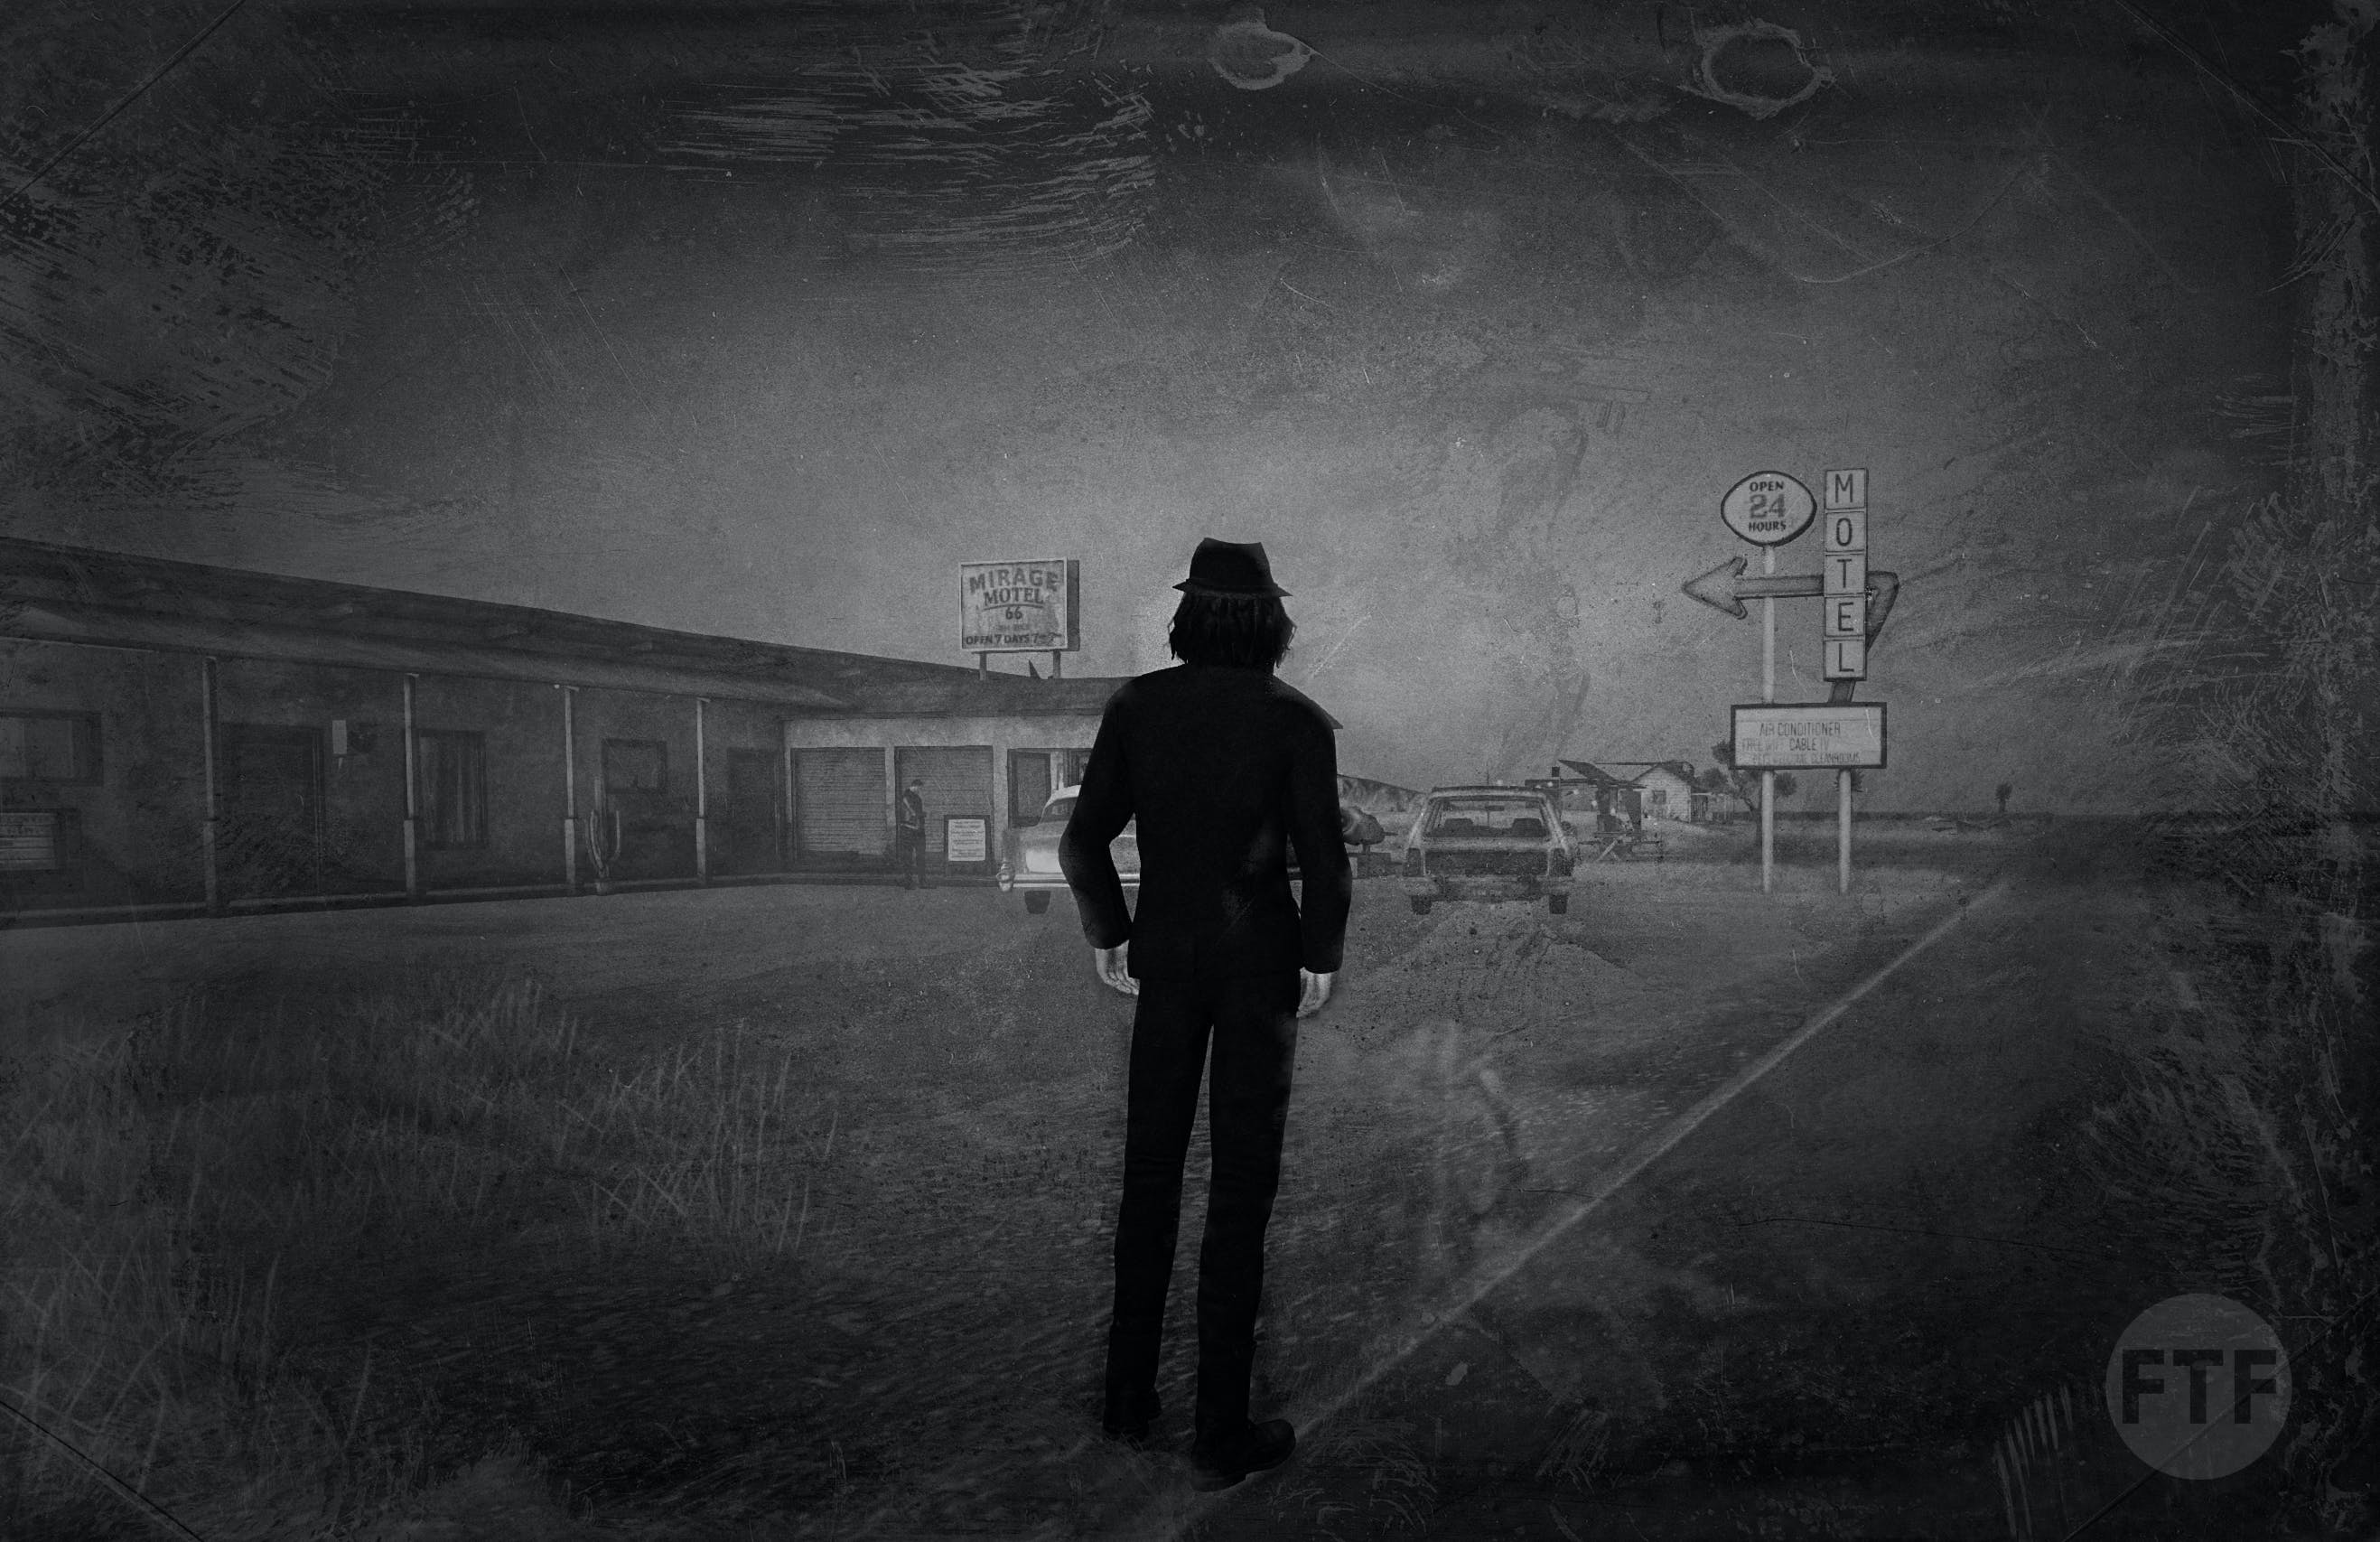 black and white, man in black